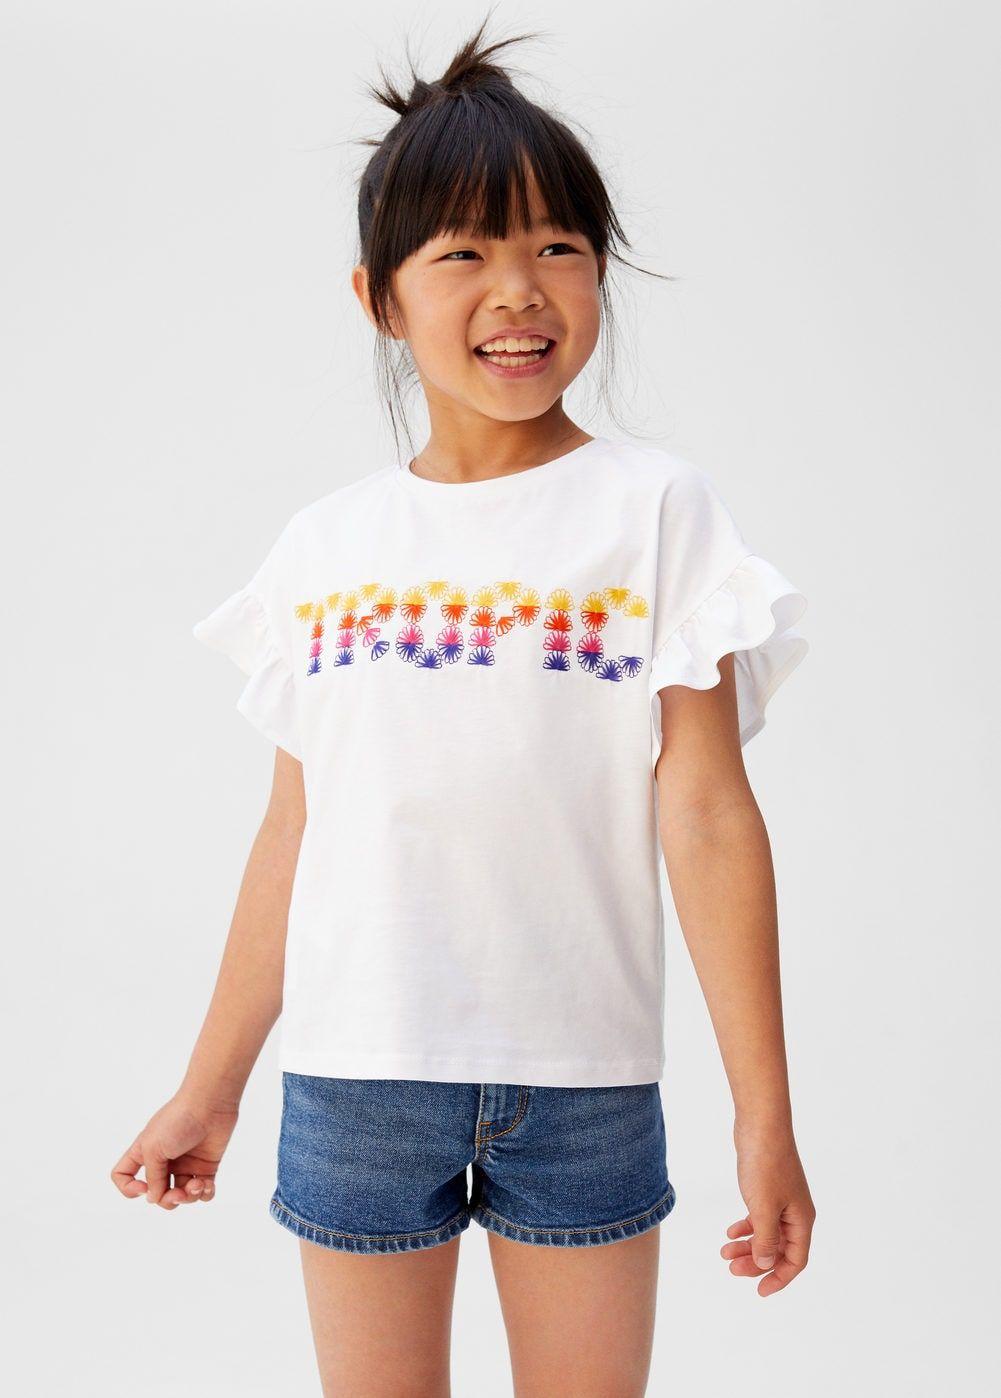 comprar online aef11 49366 Camiseta mensaje bordado - Niña | GIRLS in 2019 | Shirts for ...